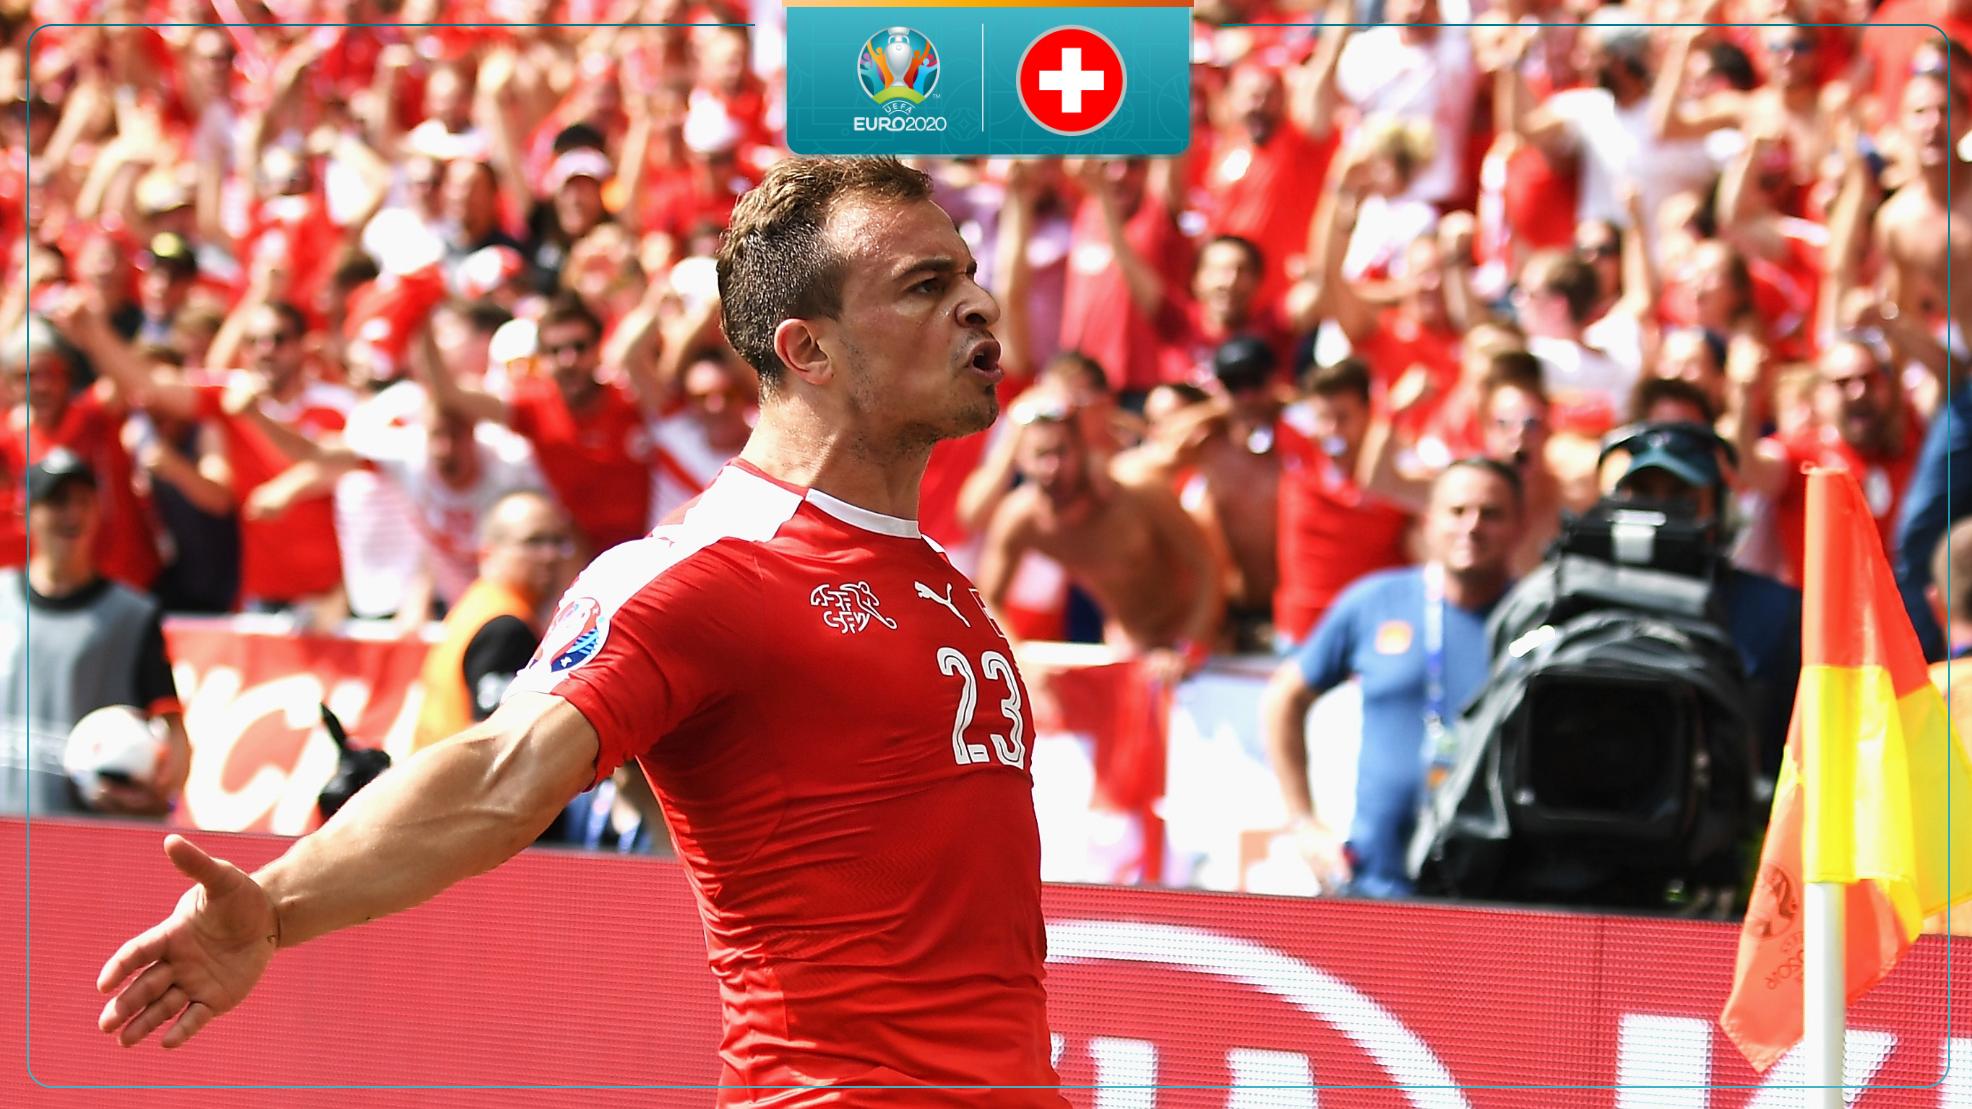 EURO contenders: Switzerland